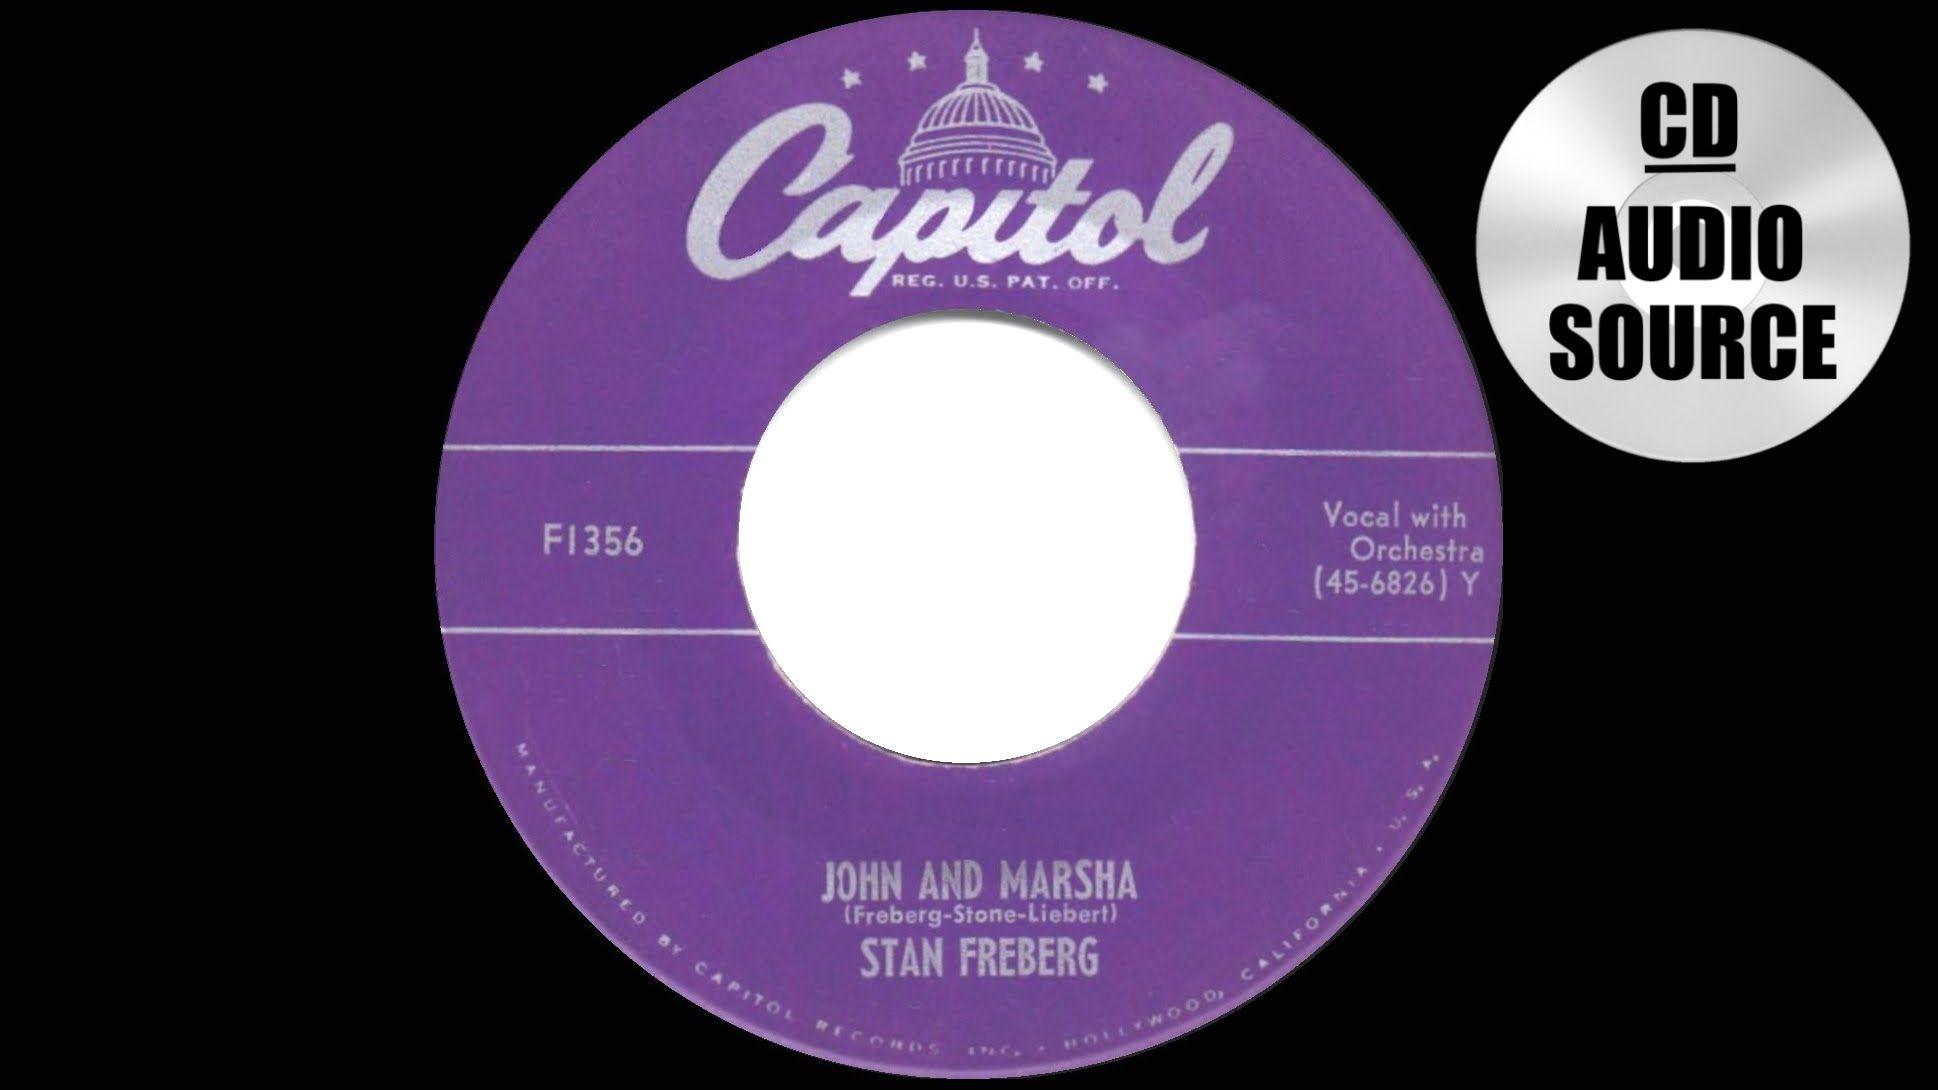 1951 HITS ARCHIVE John And Marsha Stan Freberg See